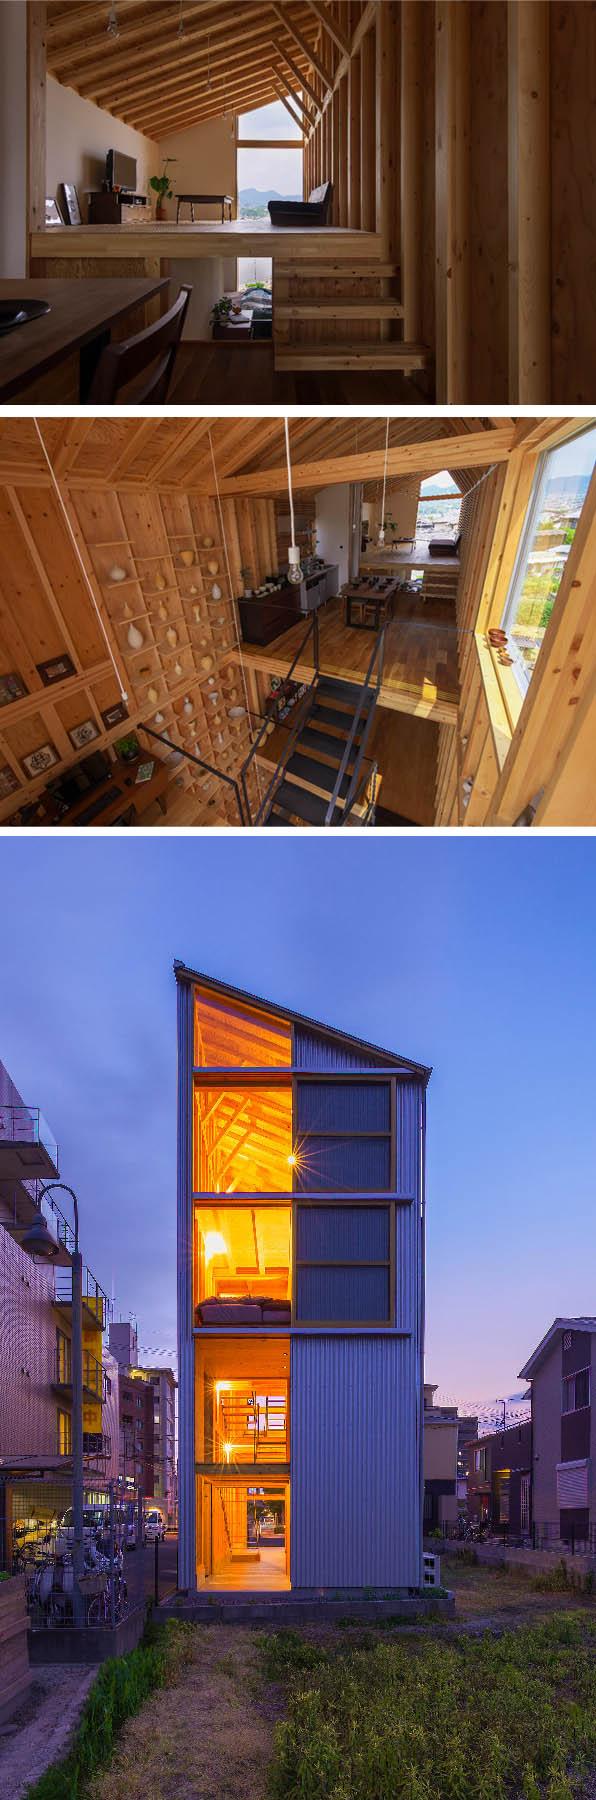 casa museo de la ceramica house-pottery-casa-ceramica-madera-japon-japan-modusvivendiarquitectura-modusvivendi-blog-modus-vivendi-arquitectura-architecture-03